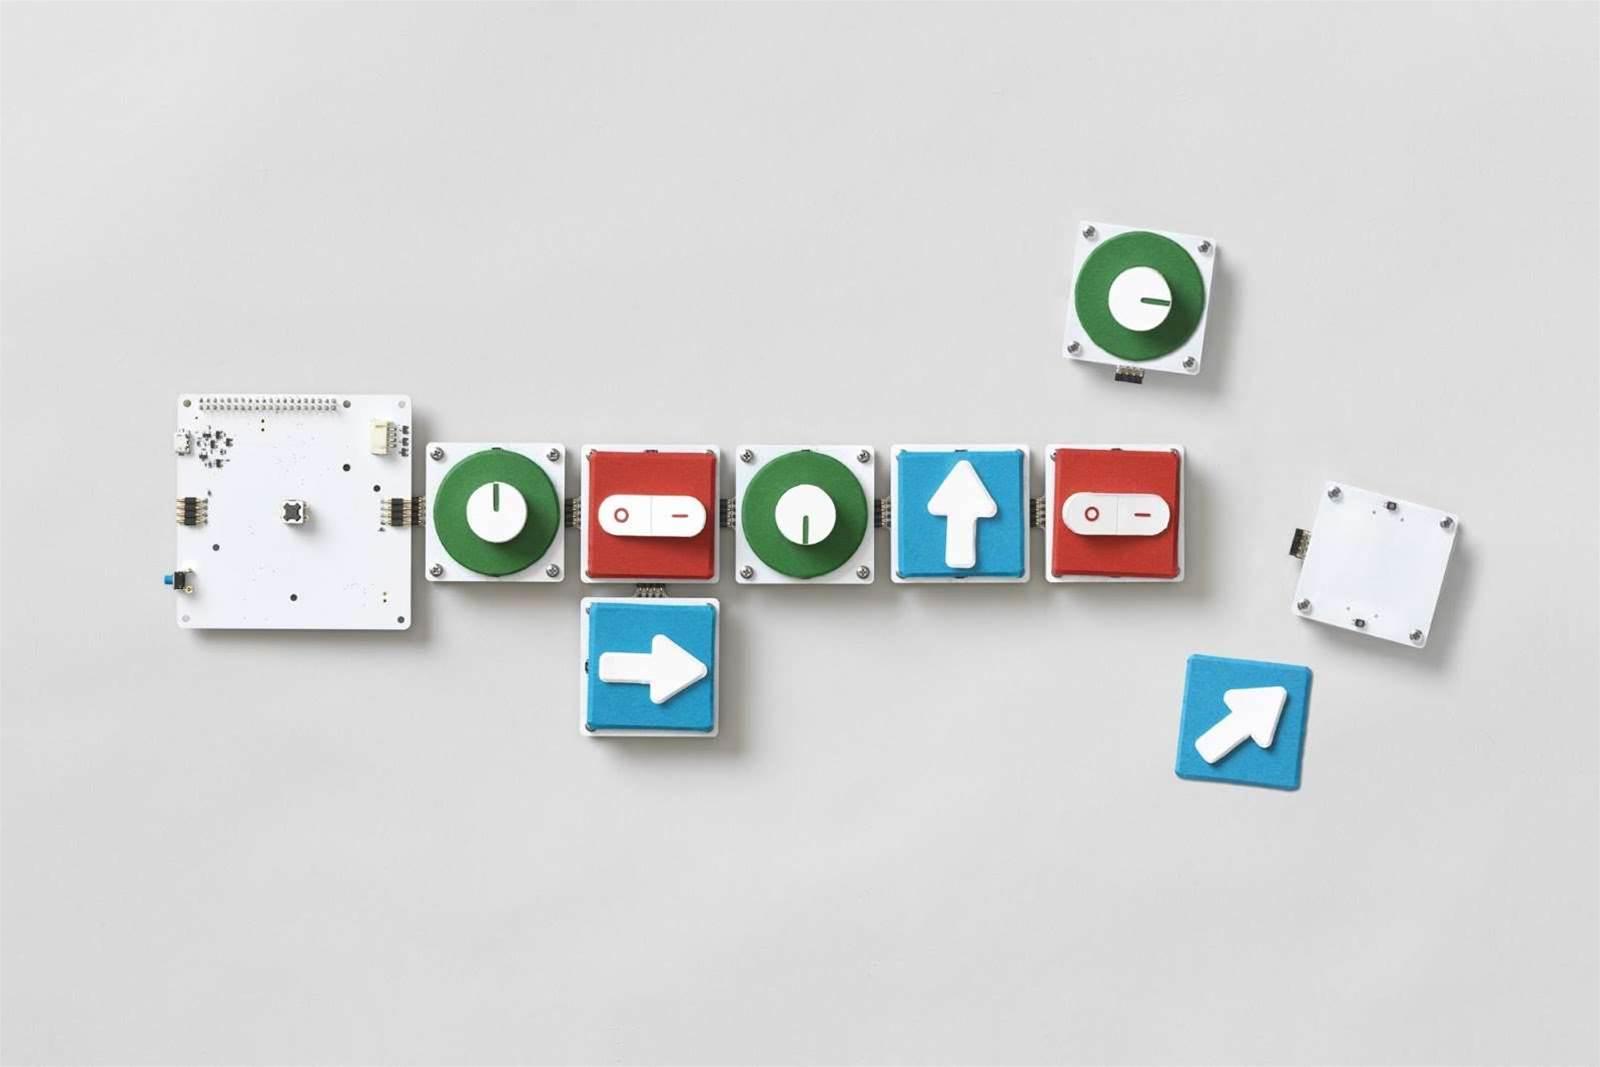 Google creates Bloks toys to help kids learn code